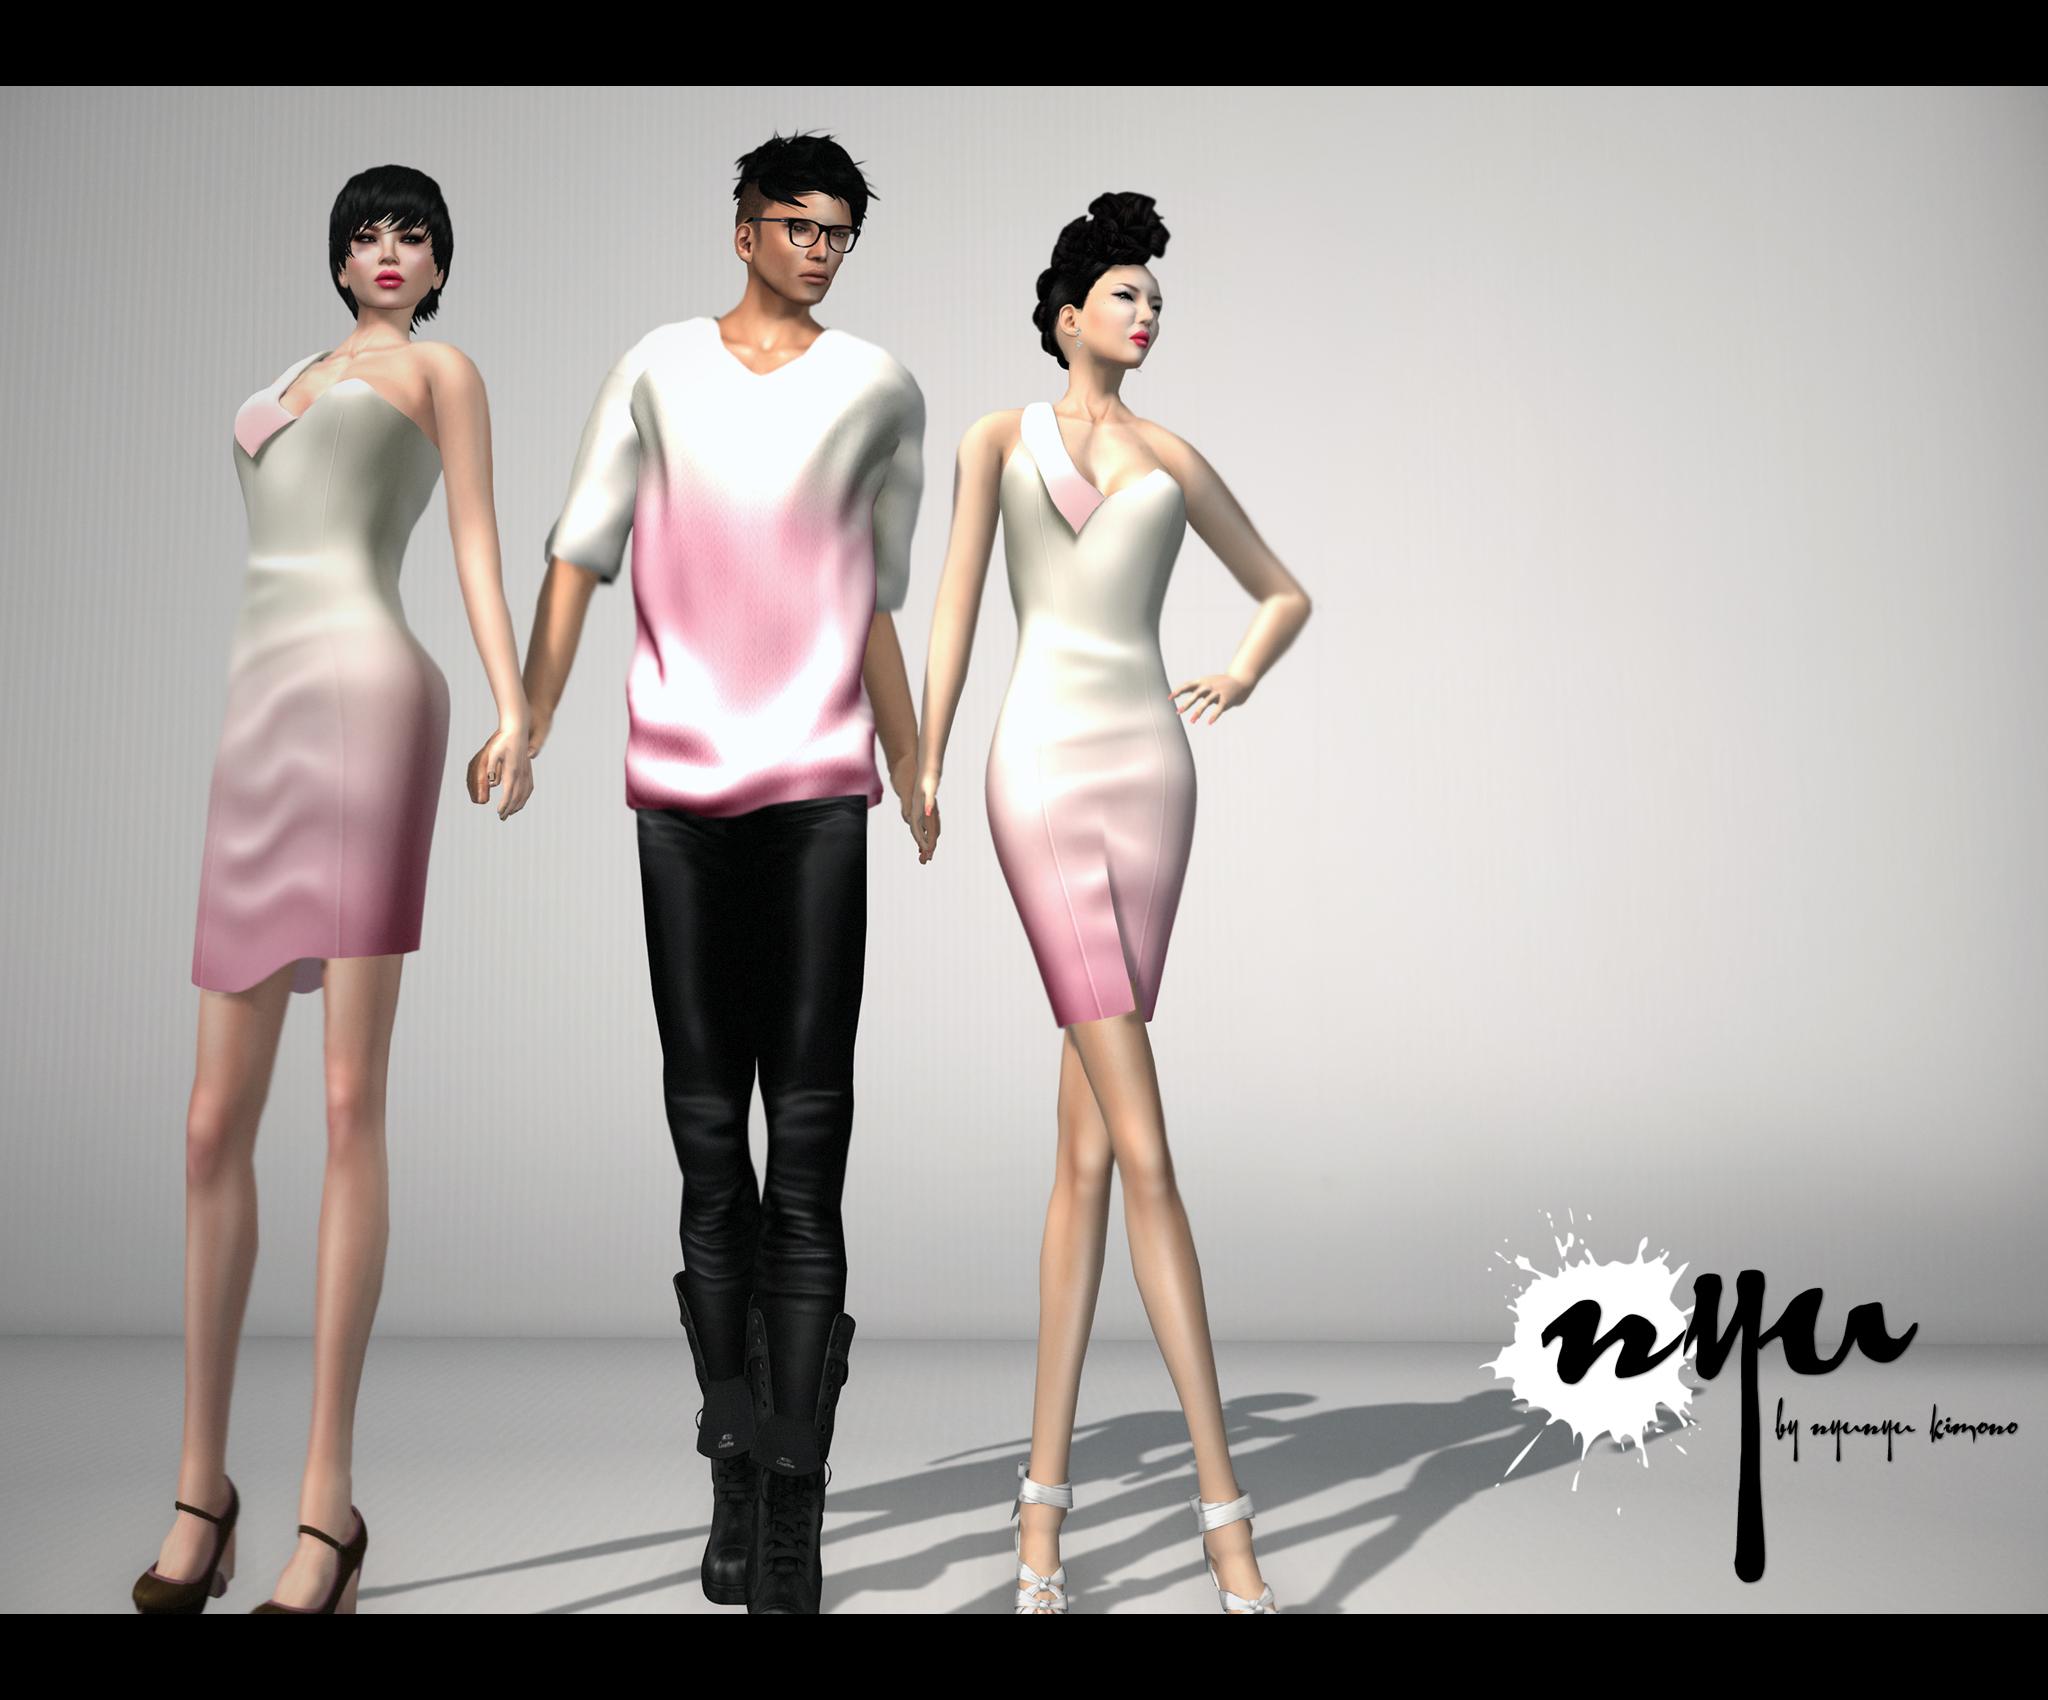 Wallpaper : Nyu, pink, kimono, supermodel, joint, girl, secondlife ...